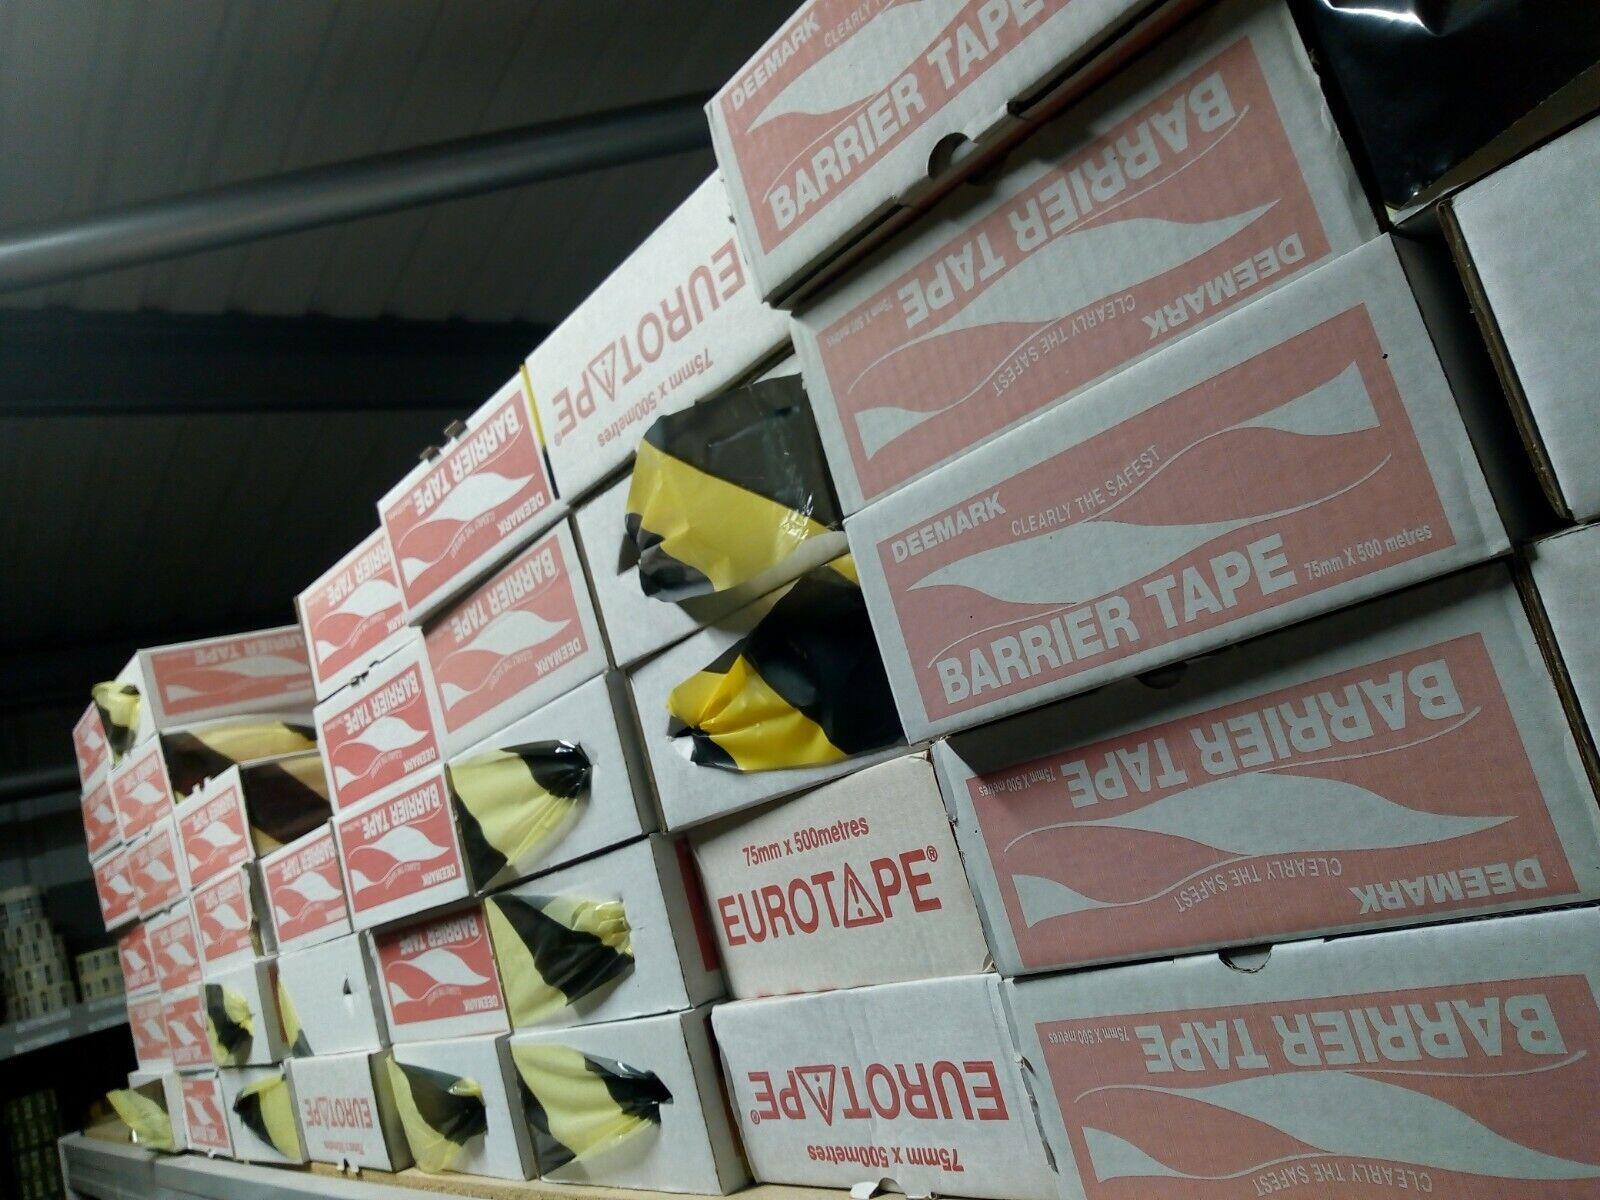 Yellow / Black Hazard Warning Tape. Non Adhesive Barrier Tape 75mm x 500m